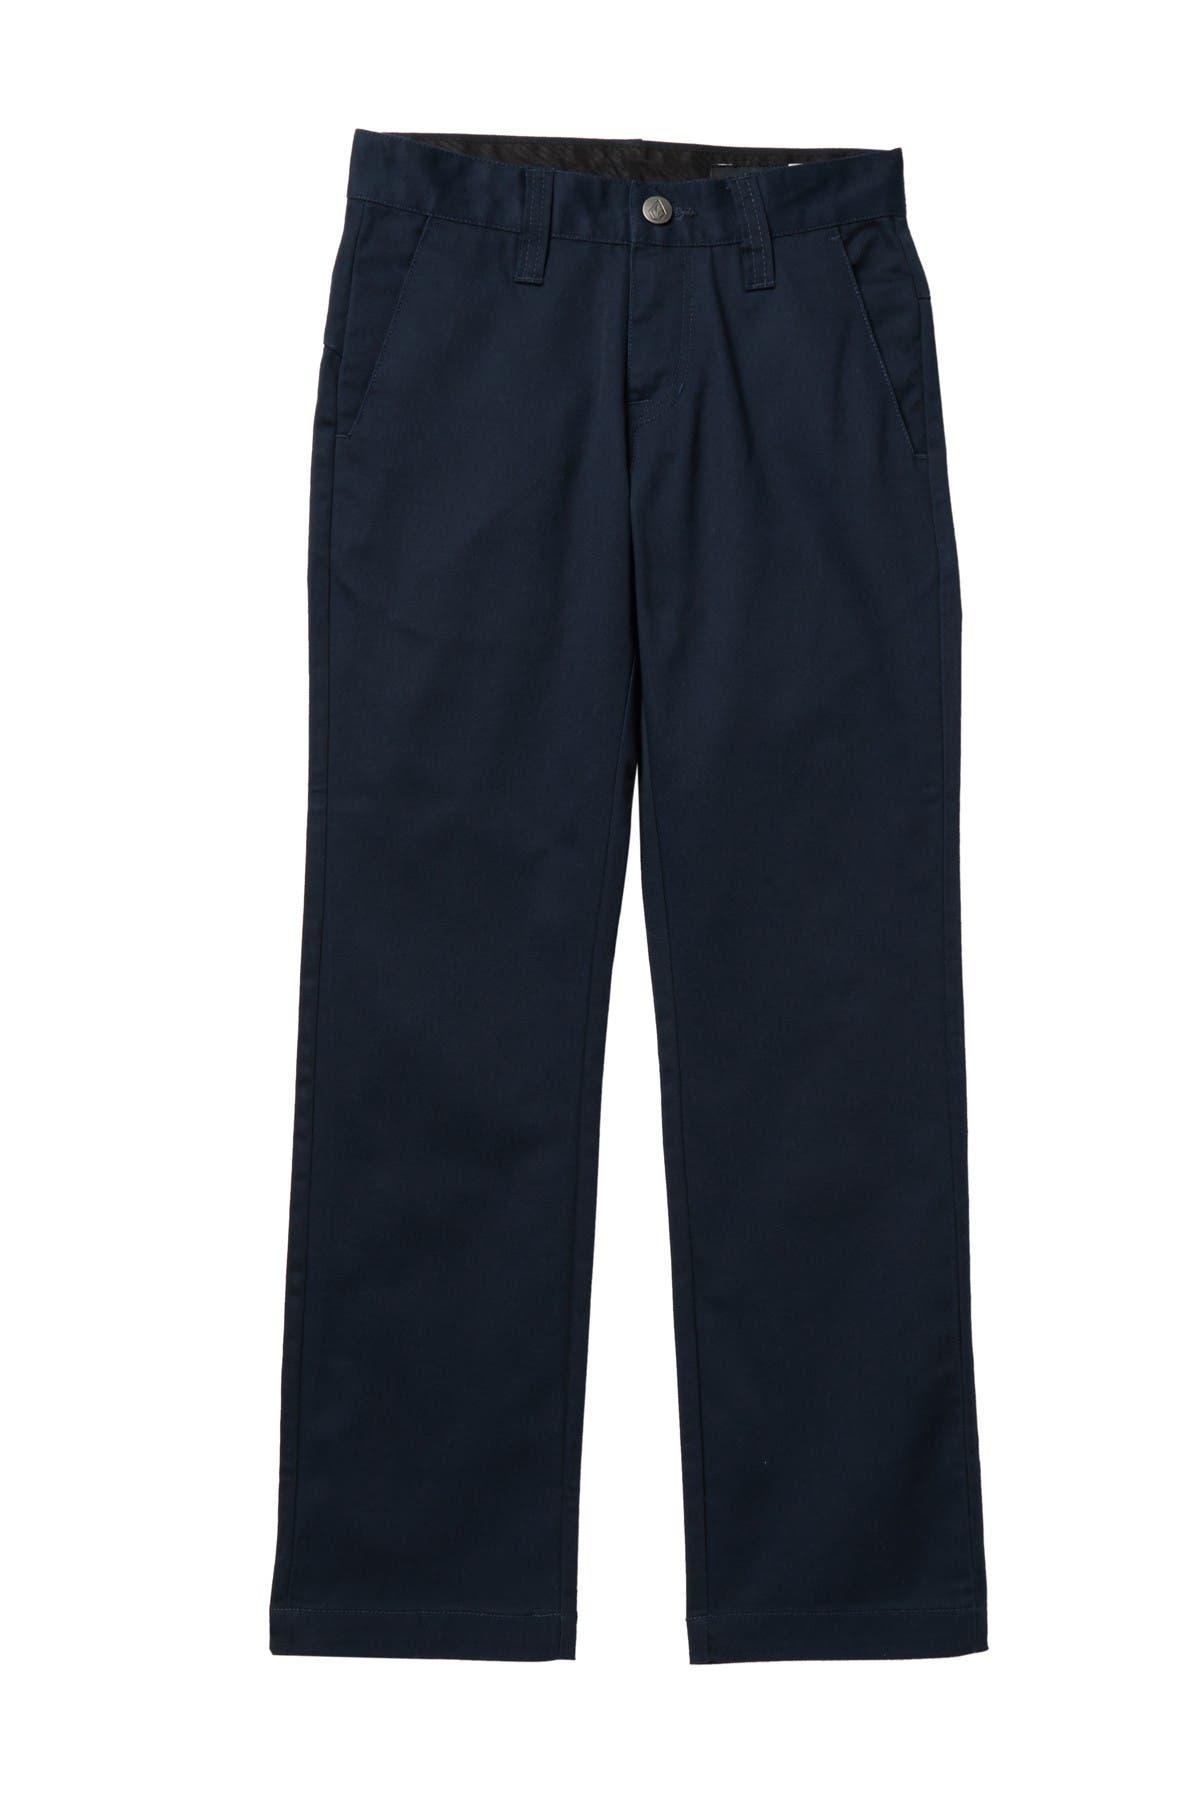 Image of Volcom Vmonty Pants